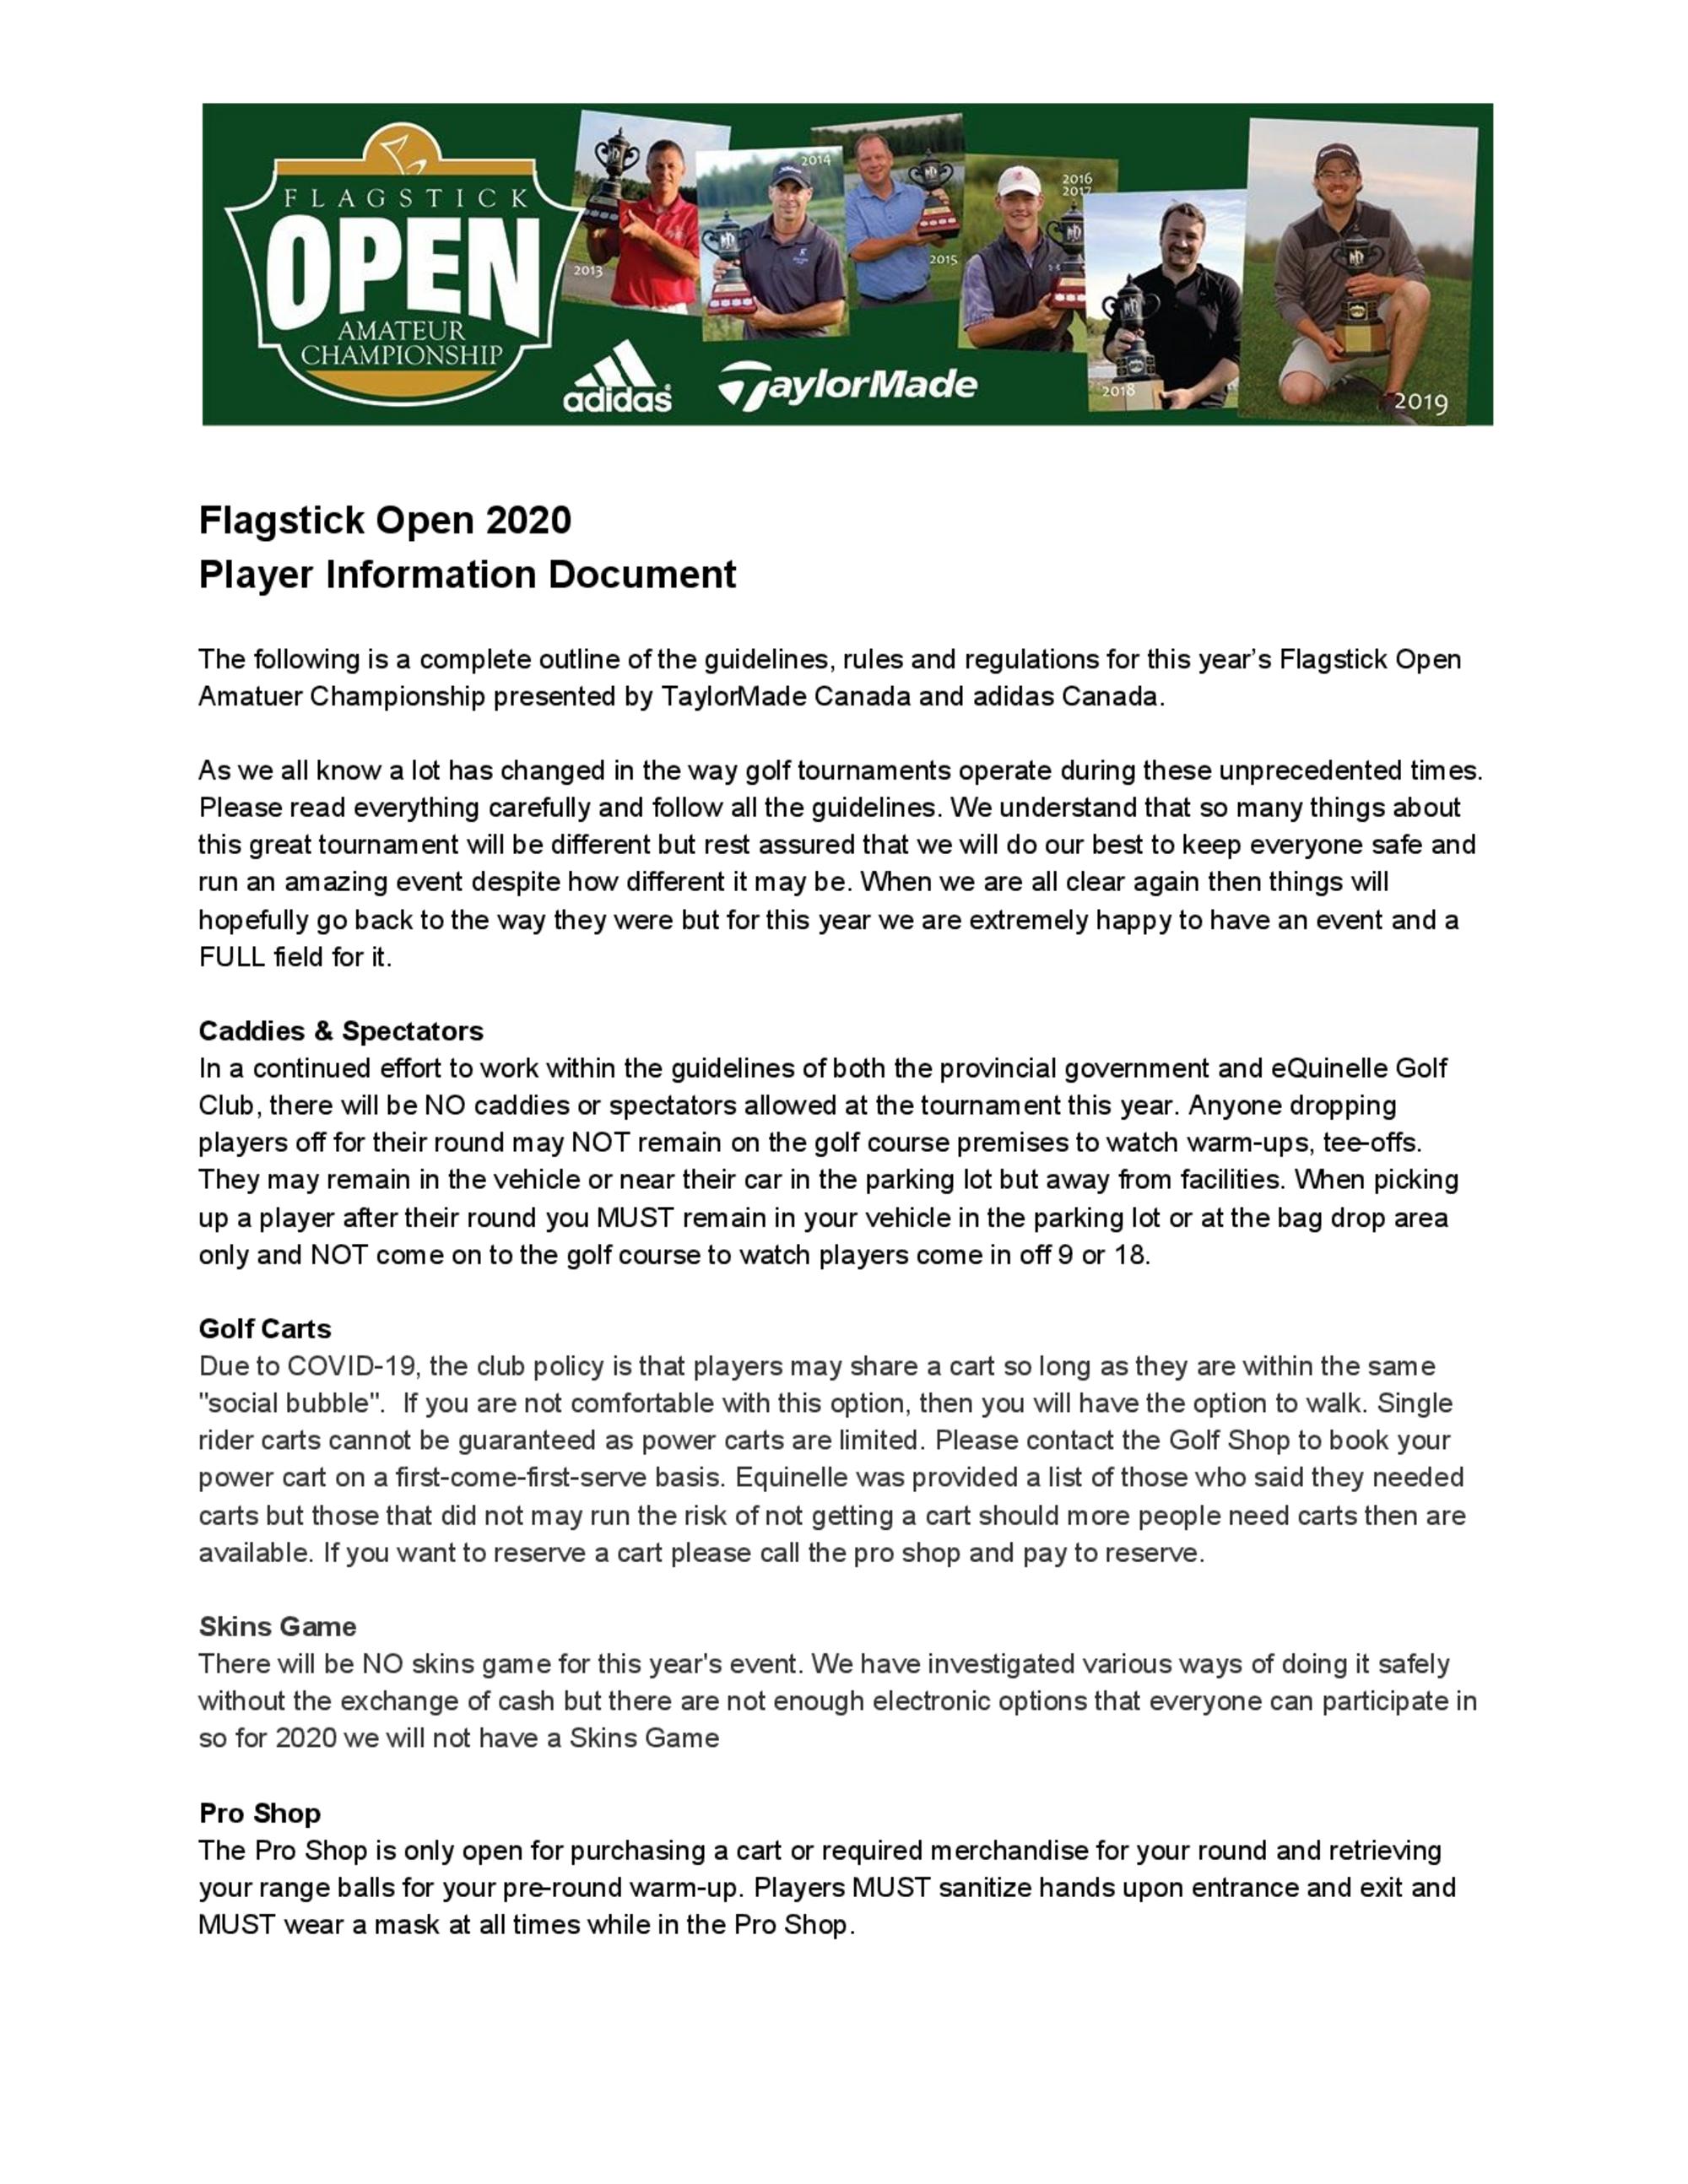 Flagstick open 2020 player information 1